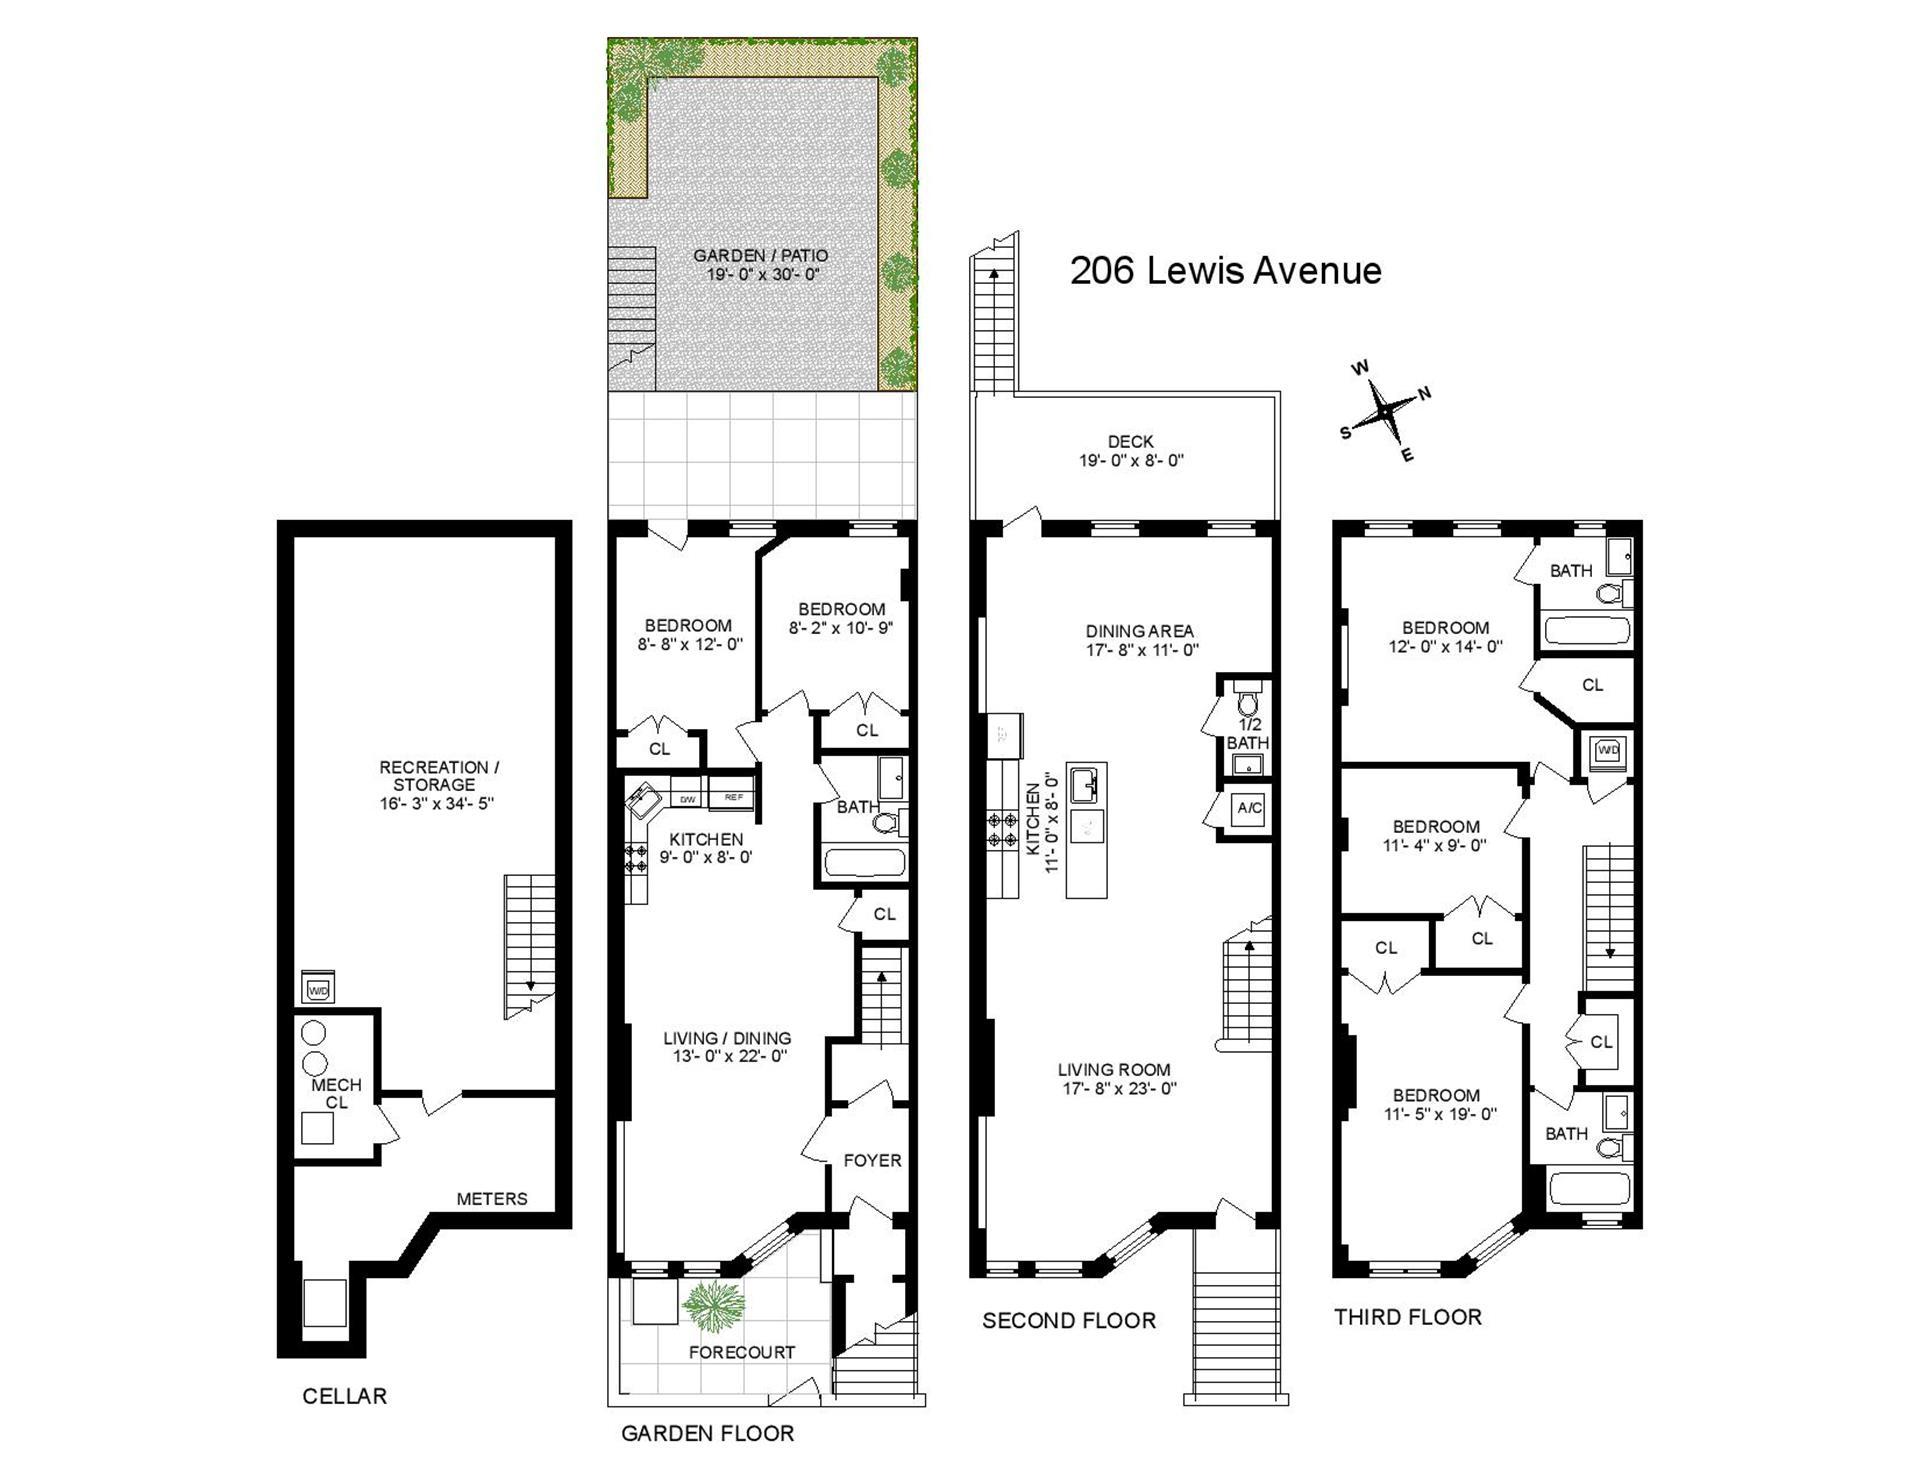 Floor plan of 206 Lewis Avenue - Bedford - Stuyvesant, New York